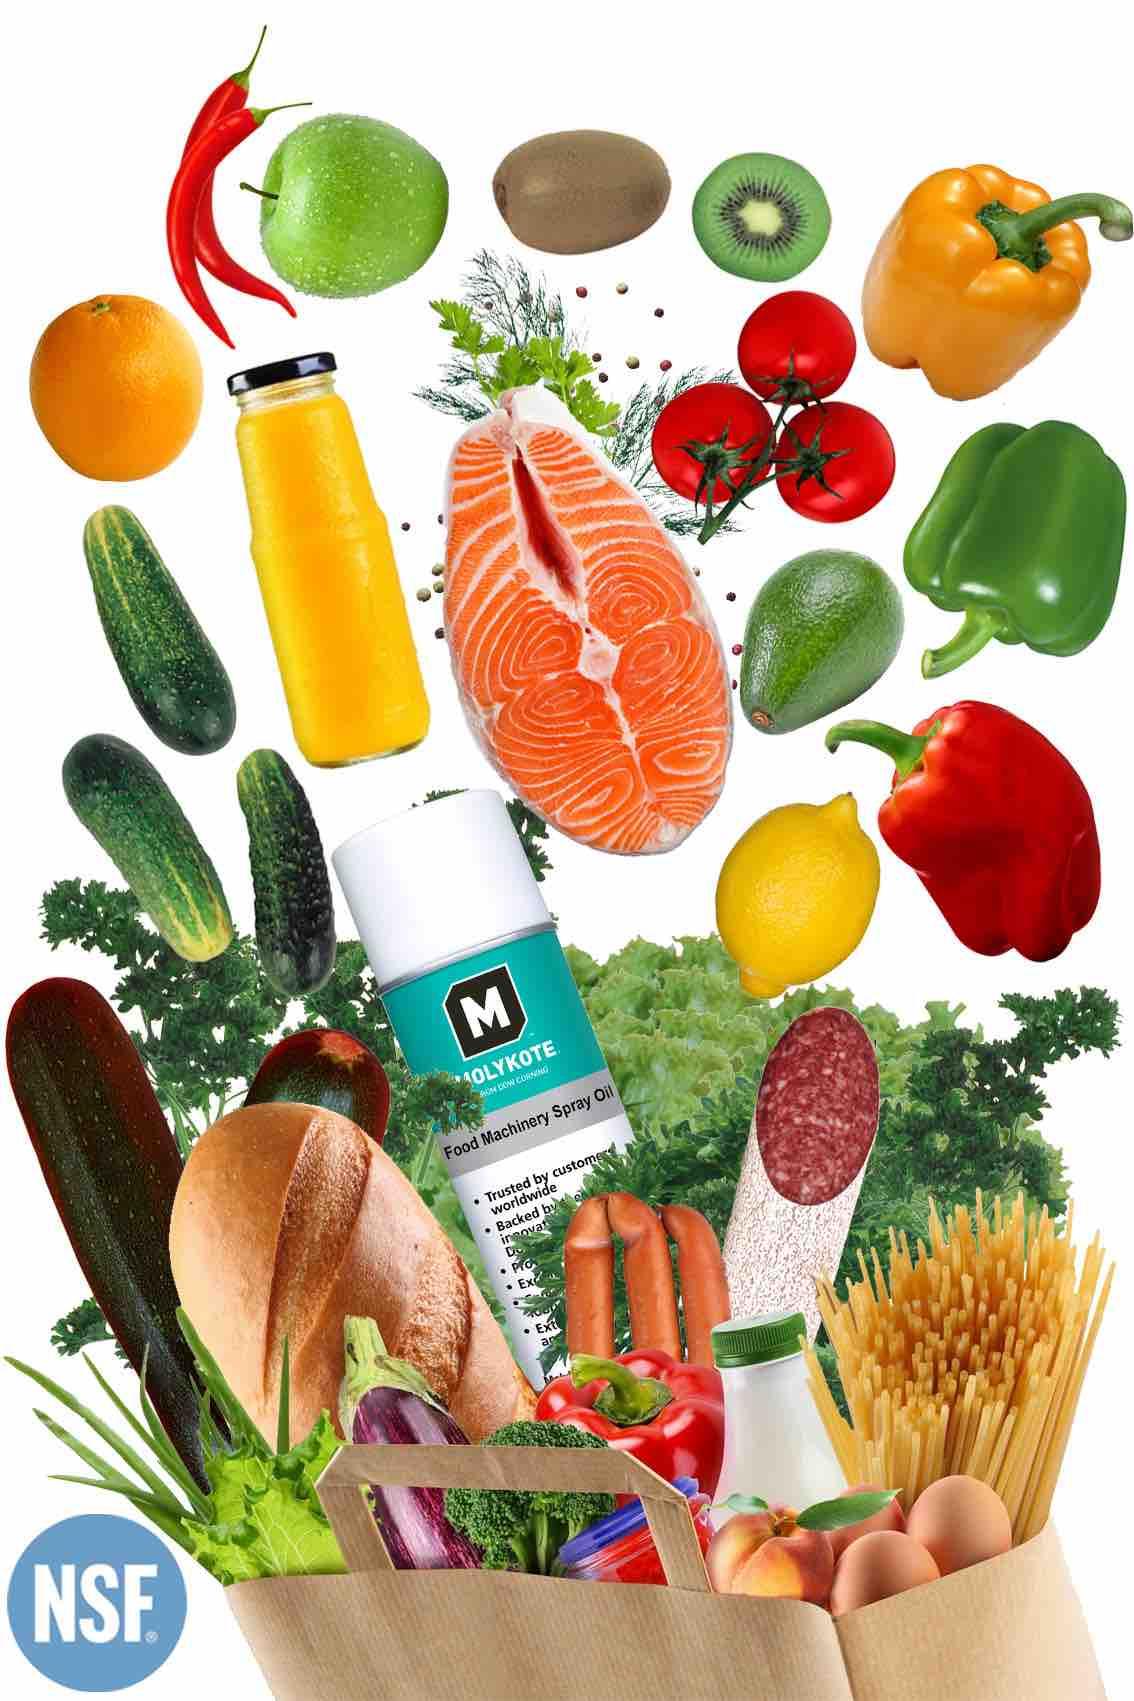 NSF -стандарт качества пищевых смазок